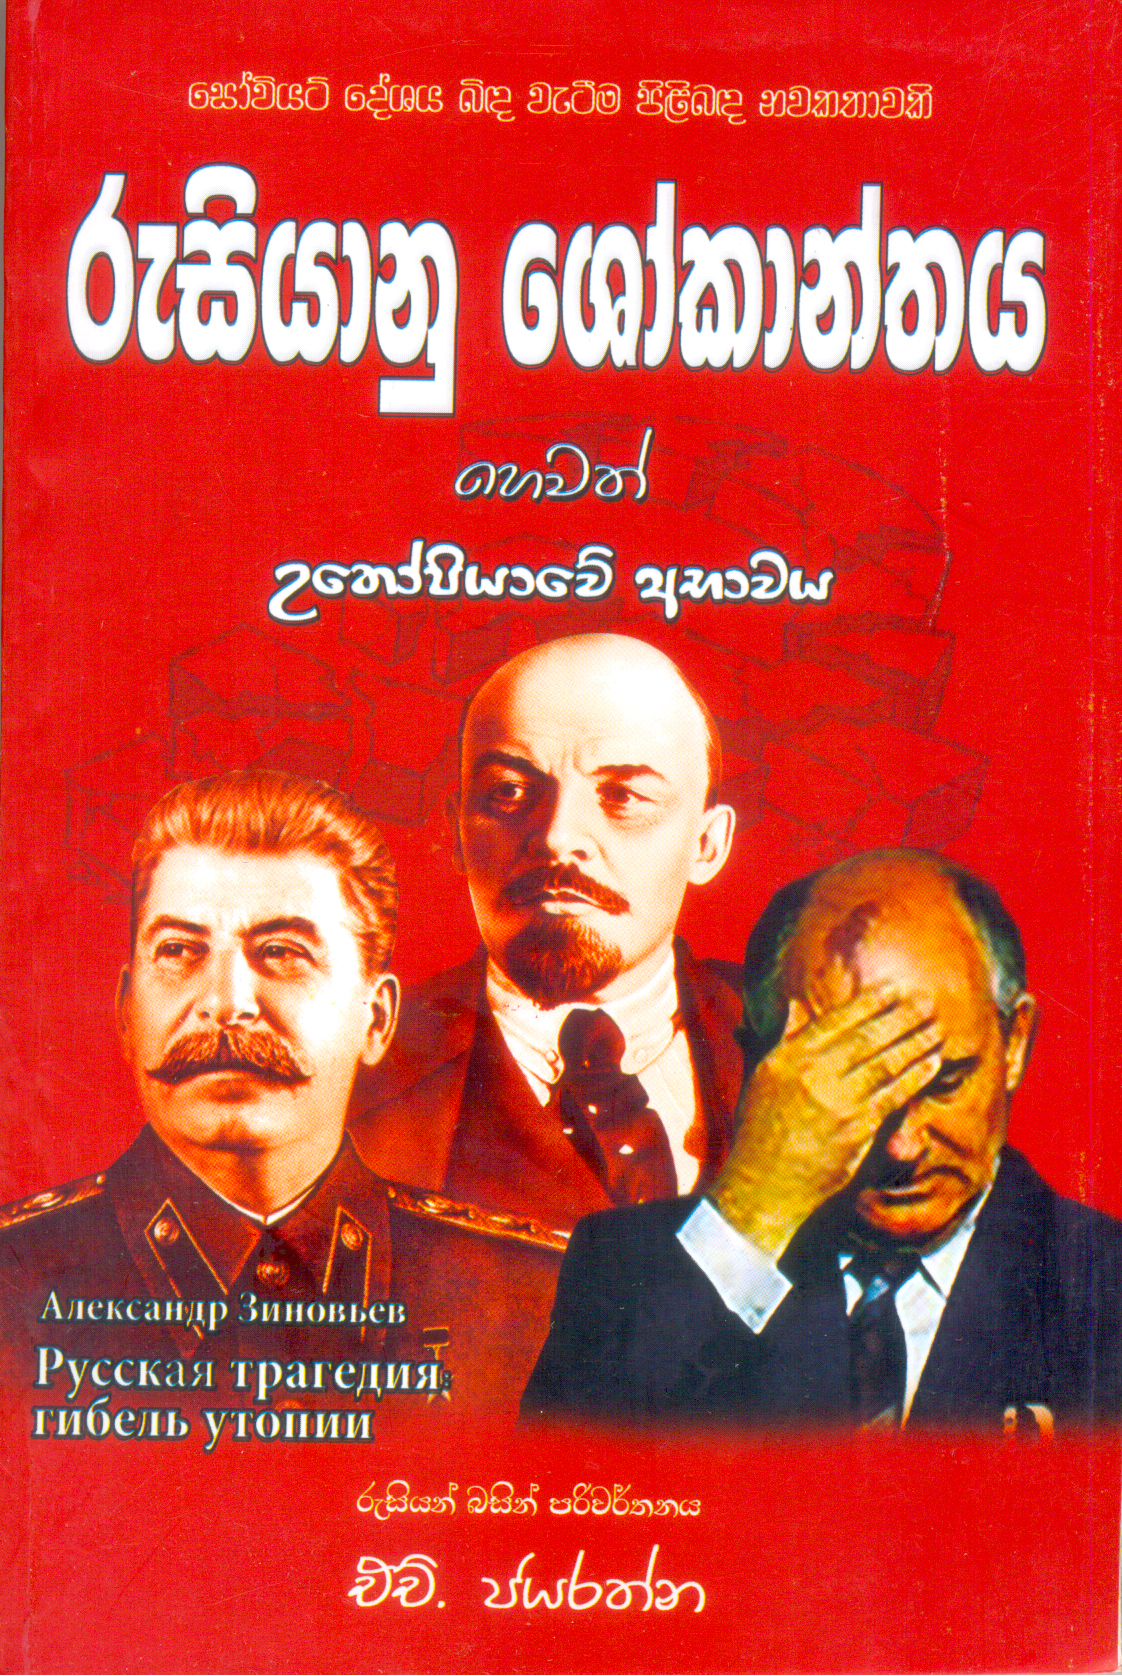 Rusiyanu Shokanthaya hewath Uthopiyawe Abhawaya